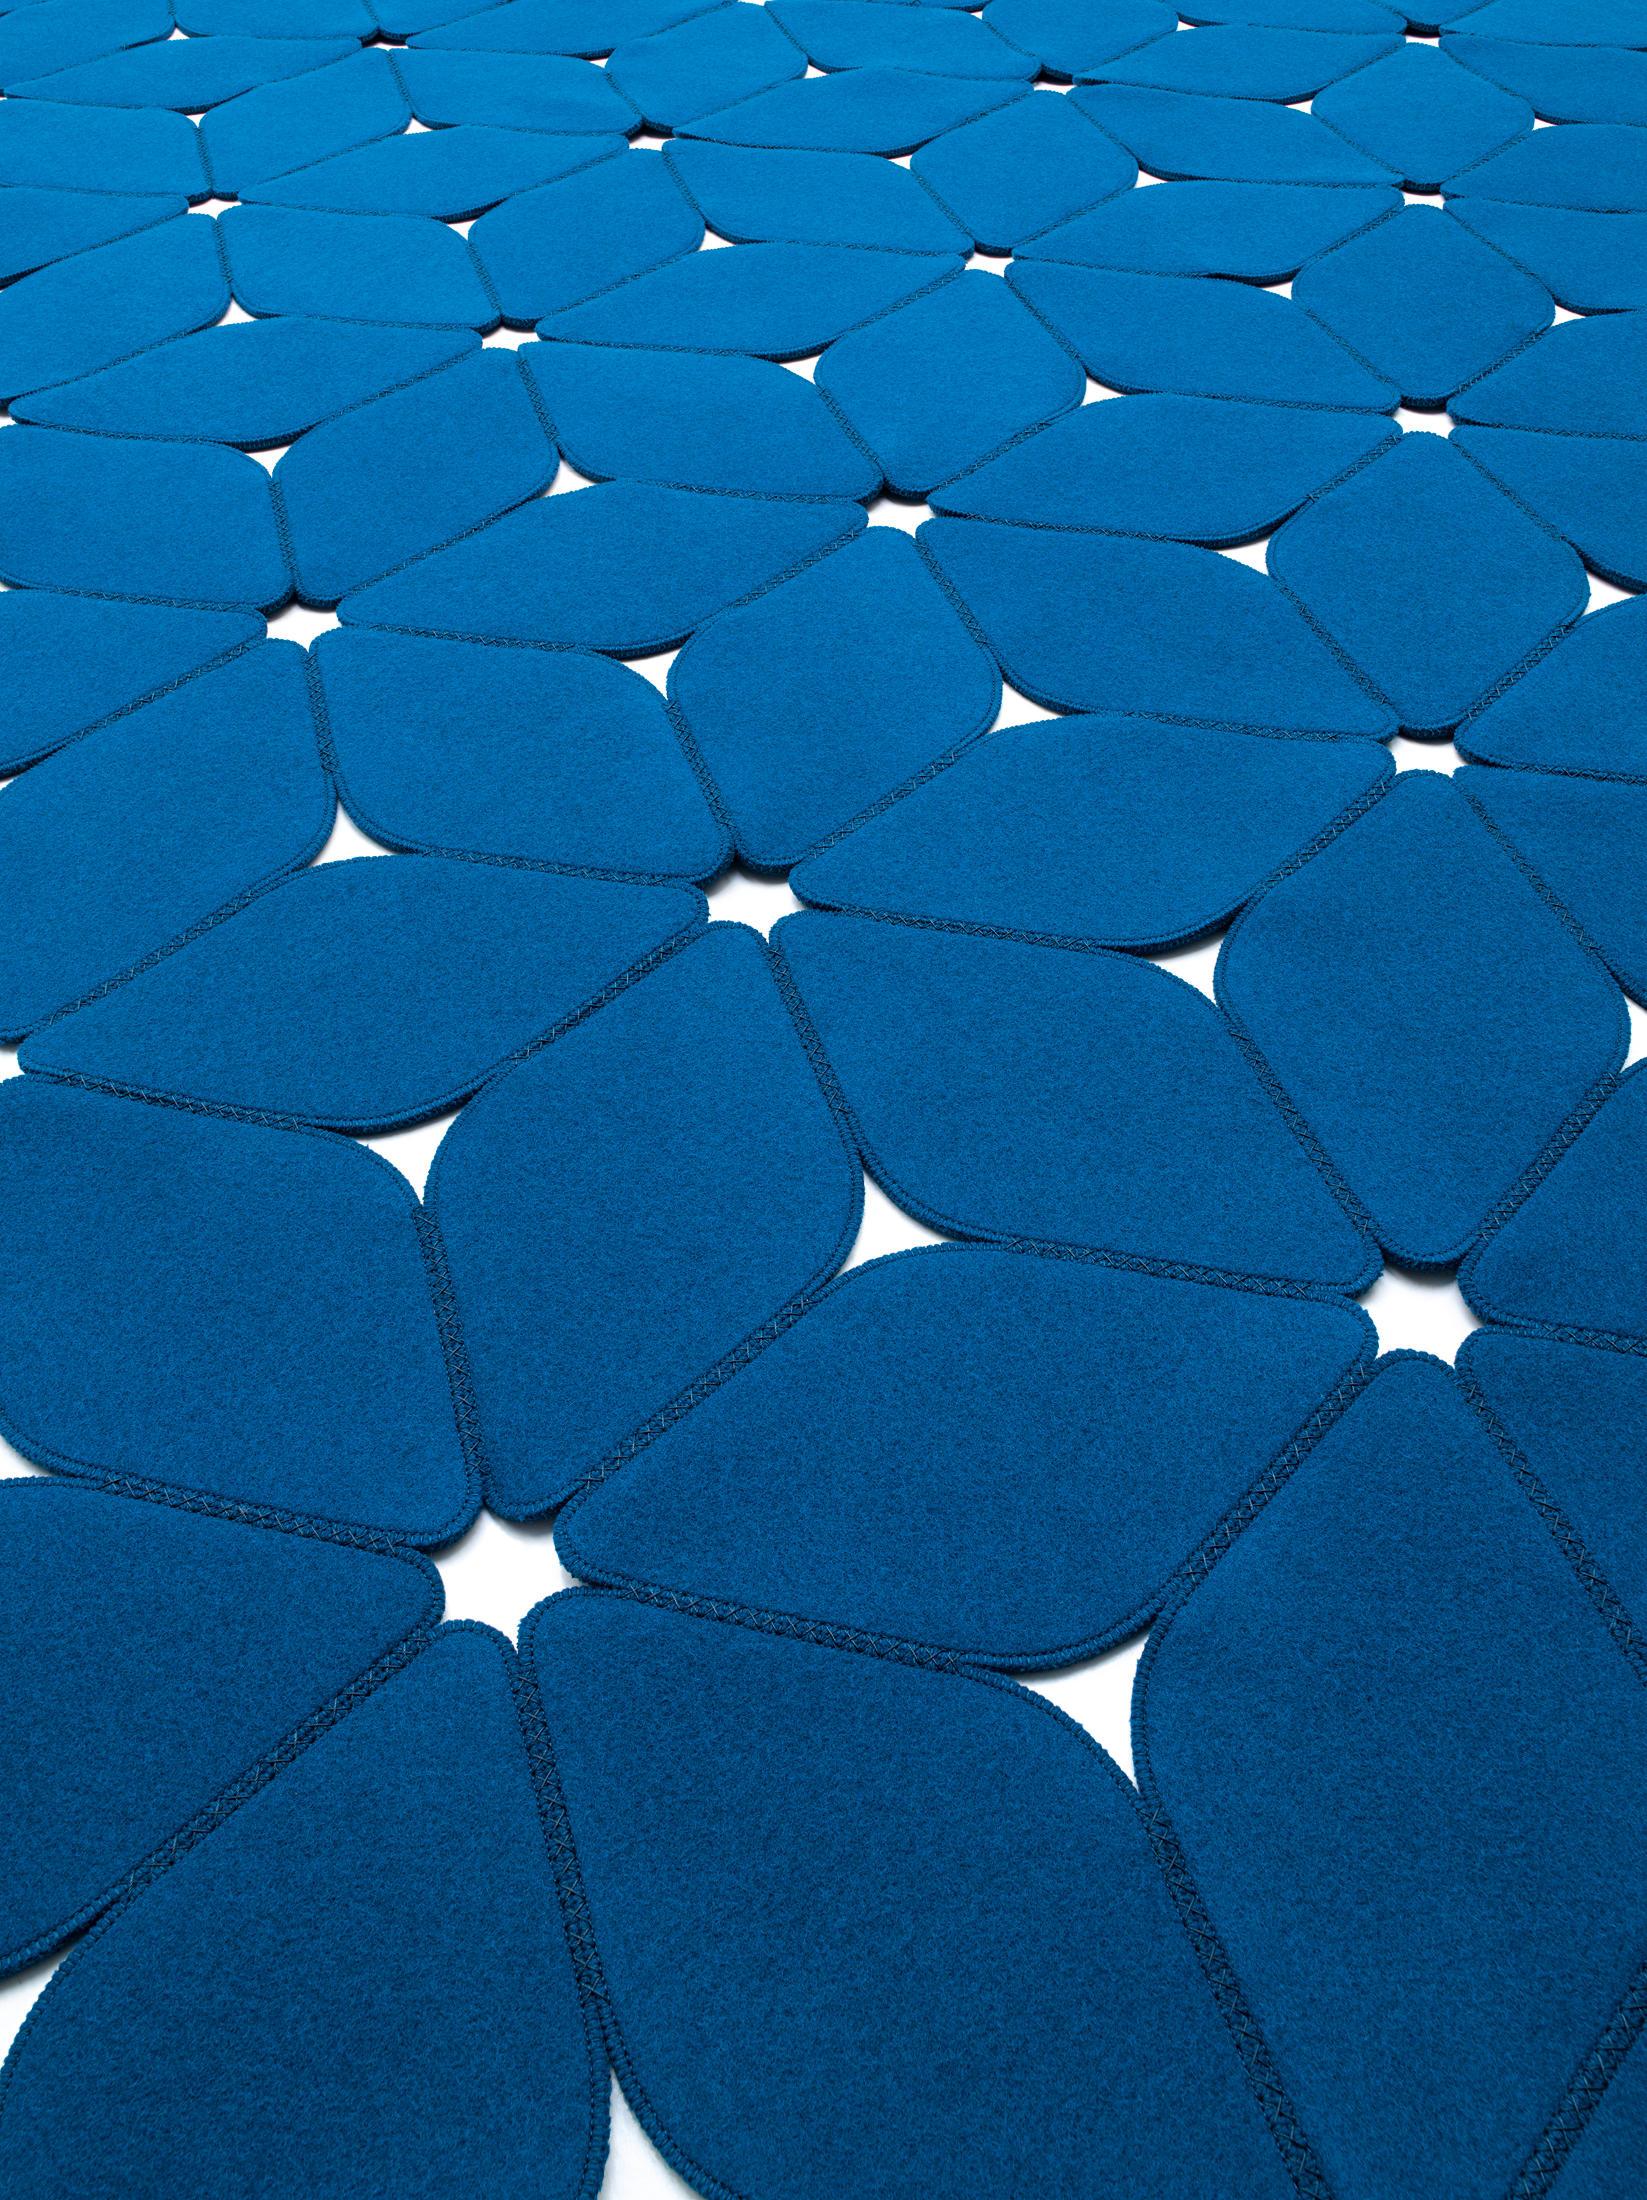 kaleidoscope formatteppiche designerteppiche von paola lenti architonic. Black Bedroom Furniture Sets. Home Design Ideas